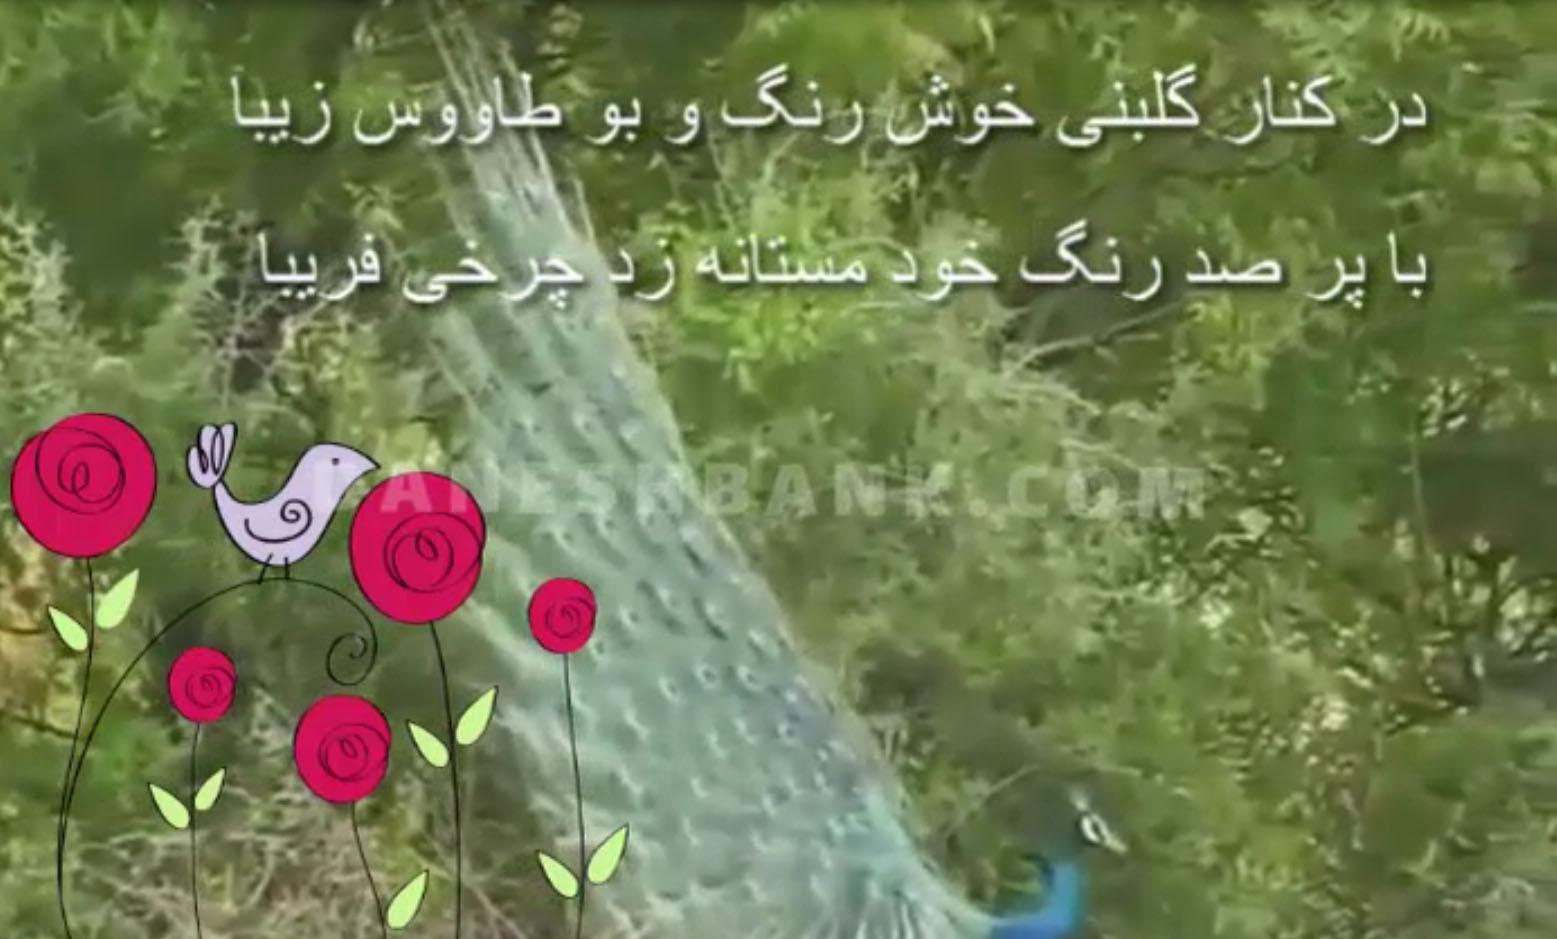 دانلود کلیپ نوروزی طاووس